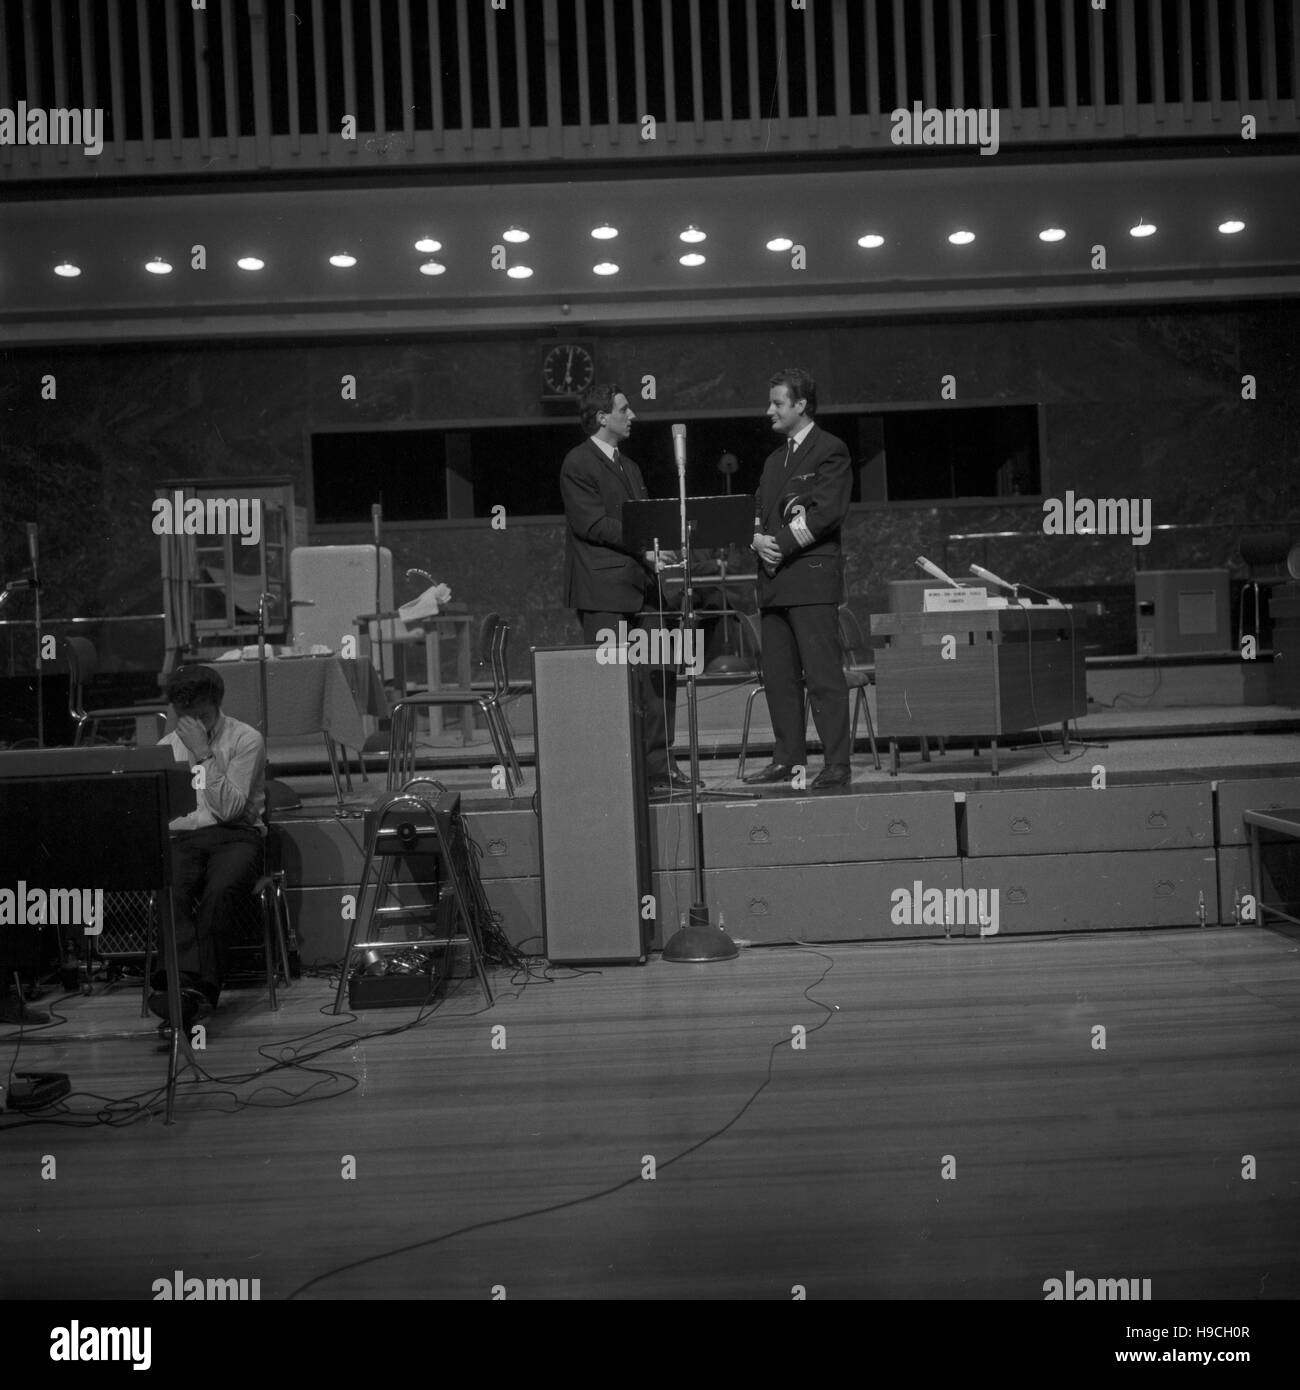 Szenenfoto Schulfunks aus einer Produktion des beim NDR à Hambourg, Deutschland 1960 er Jahre. Prise de la télévision éducative au Norddeutscher Rundfunk de Hambourg, Allemagne 1960. Banque D'Images